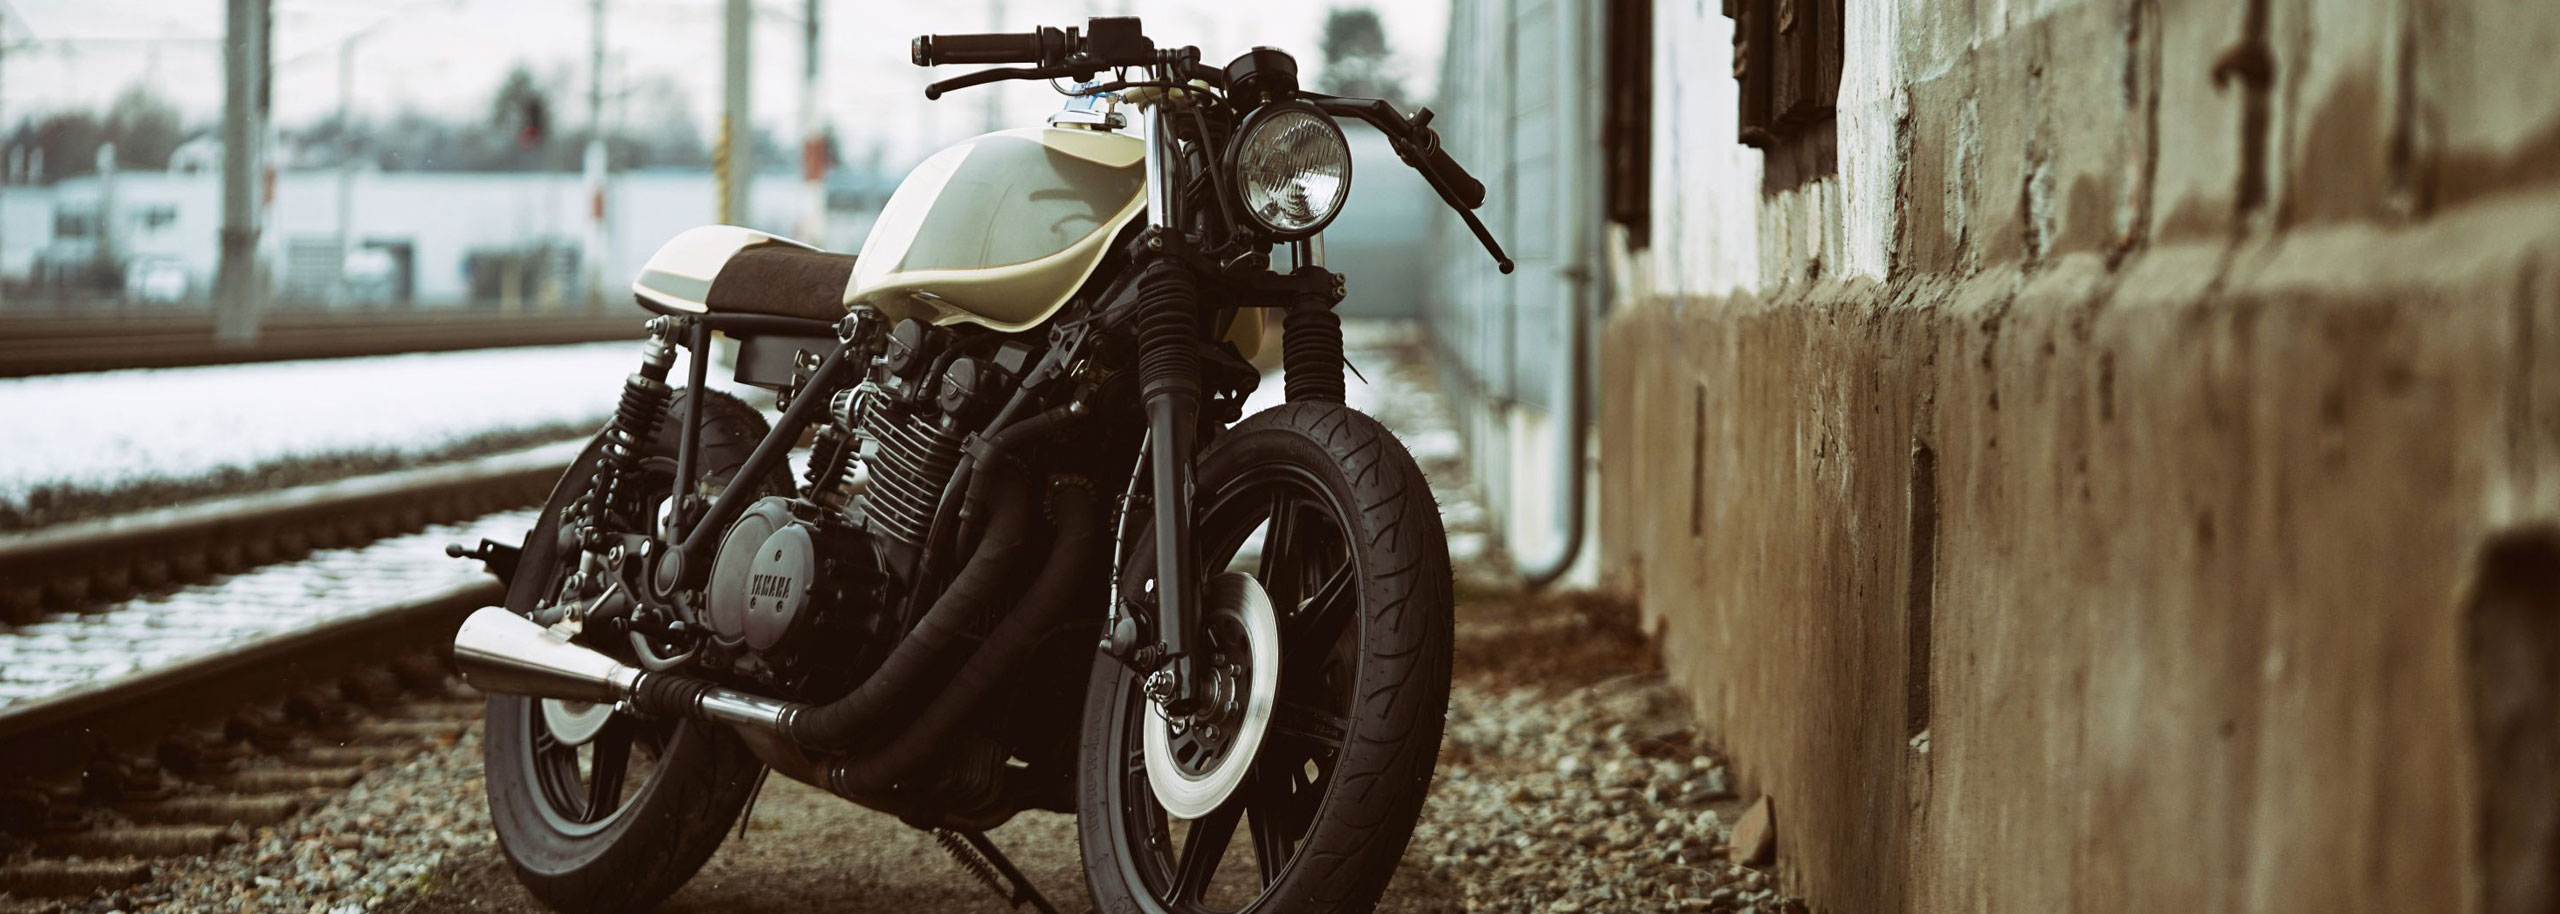 04_TITAN-Heavy-Metal_Honda-Umbau-XS-850_Cafe-Racer-Graz-Motorrad-Umbau-Austria-Vintage_Custom-Bikes-Sattel-Heck-Umbau